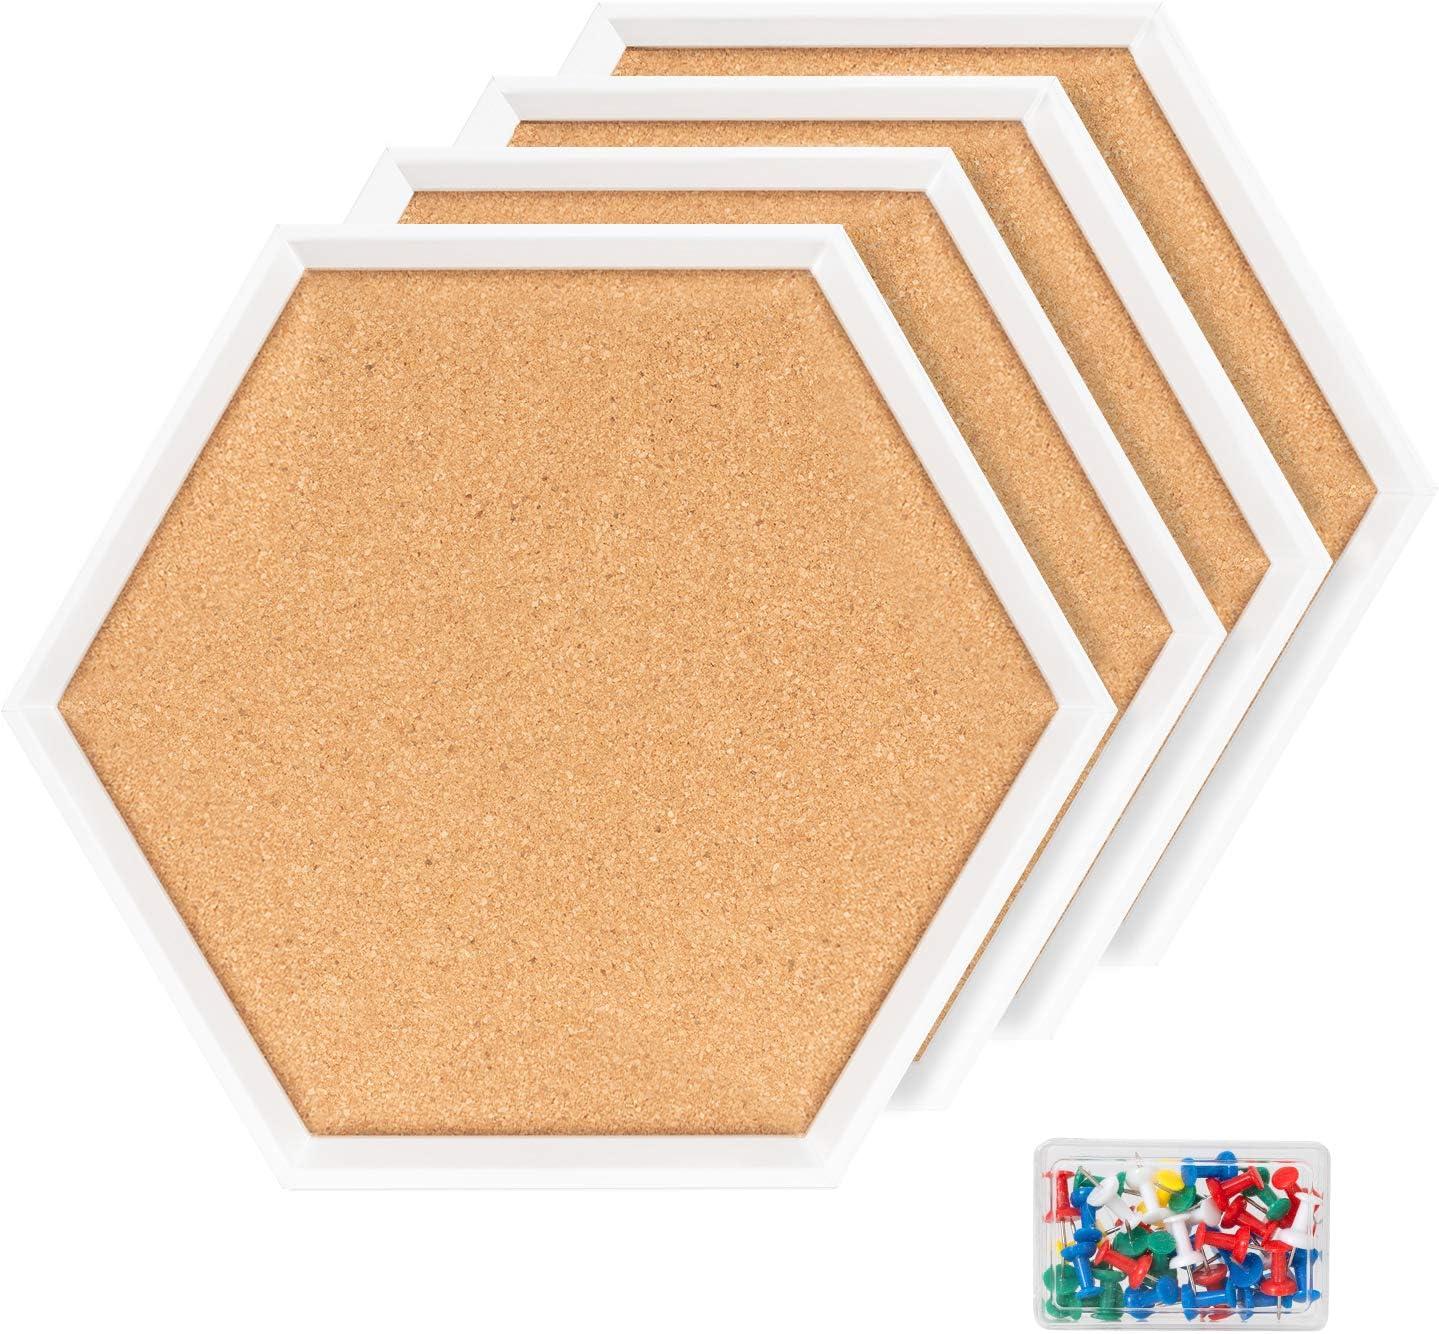 4 Packs Cork Boards Choice Hexagon Shape Bulletin White Boa Many popular brands Framed with